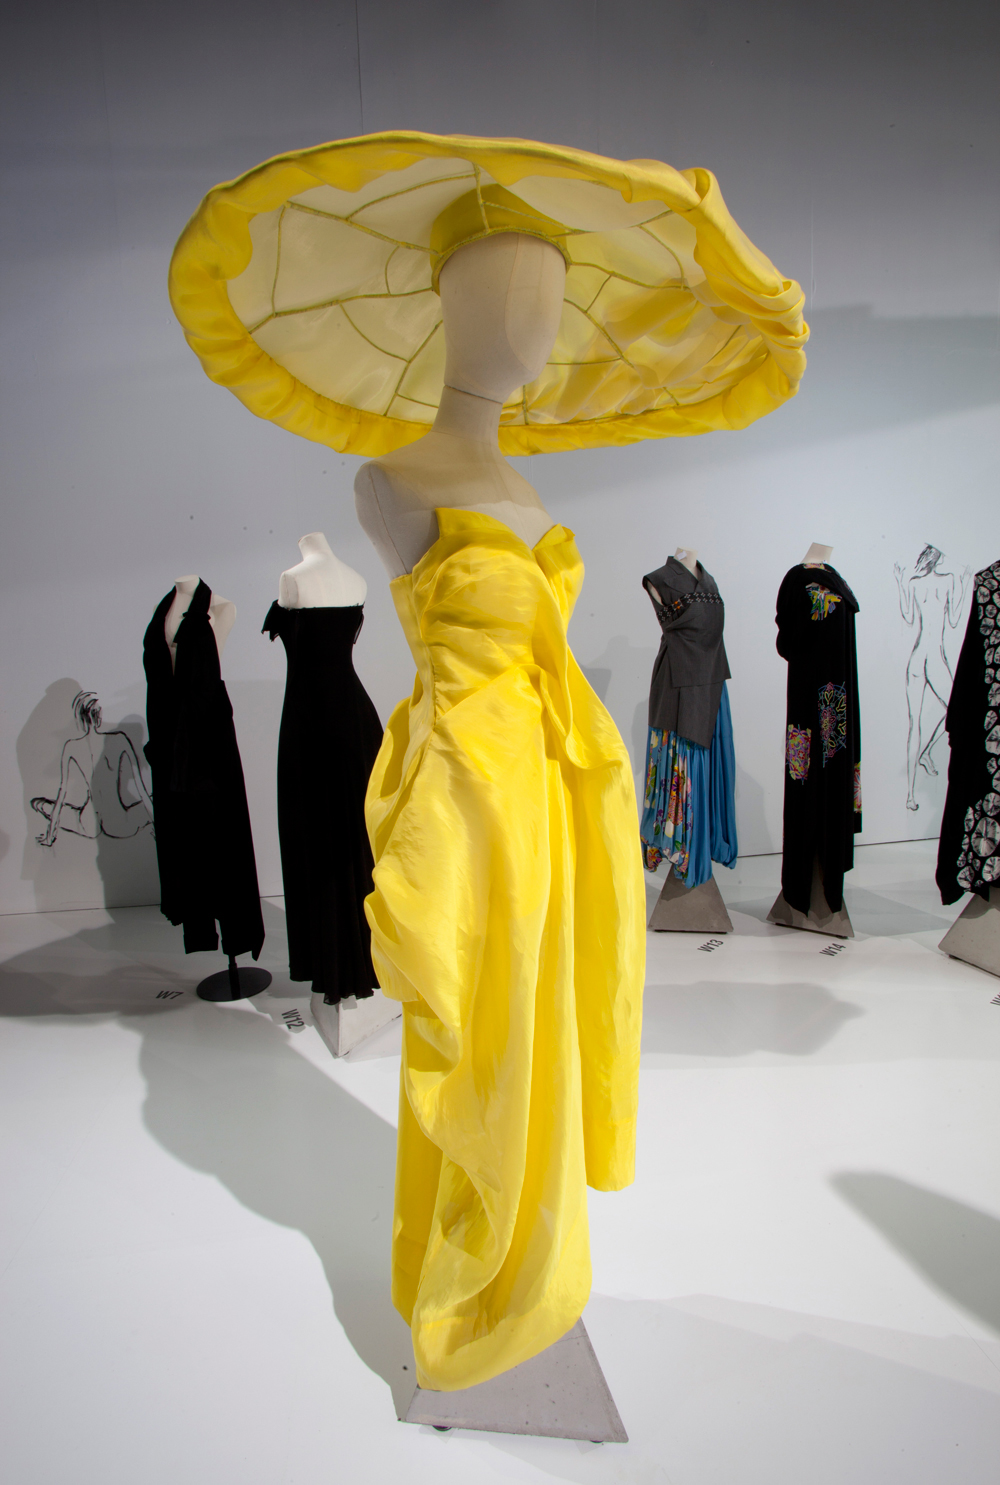 Yohji Yamamoto: About the exhibition - Victoria and Albert